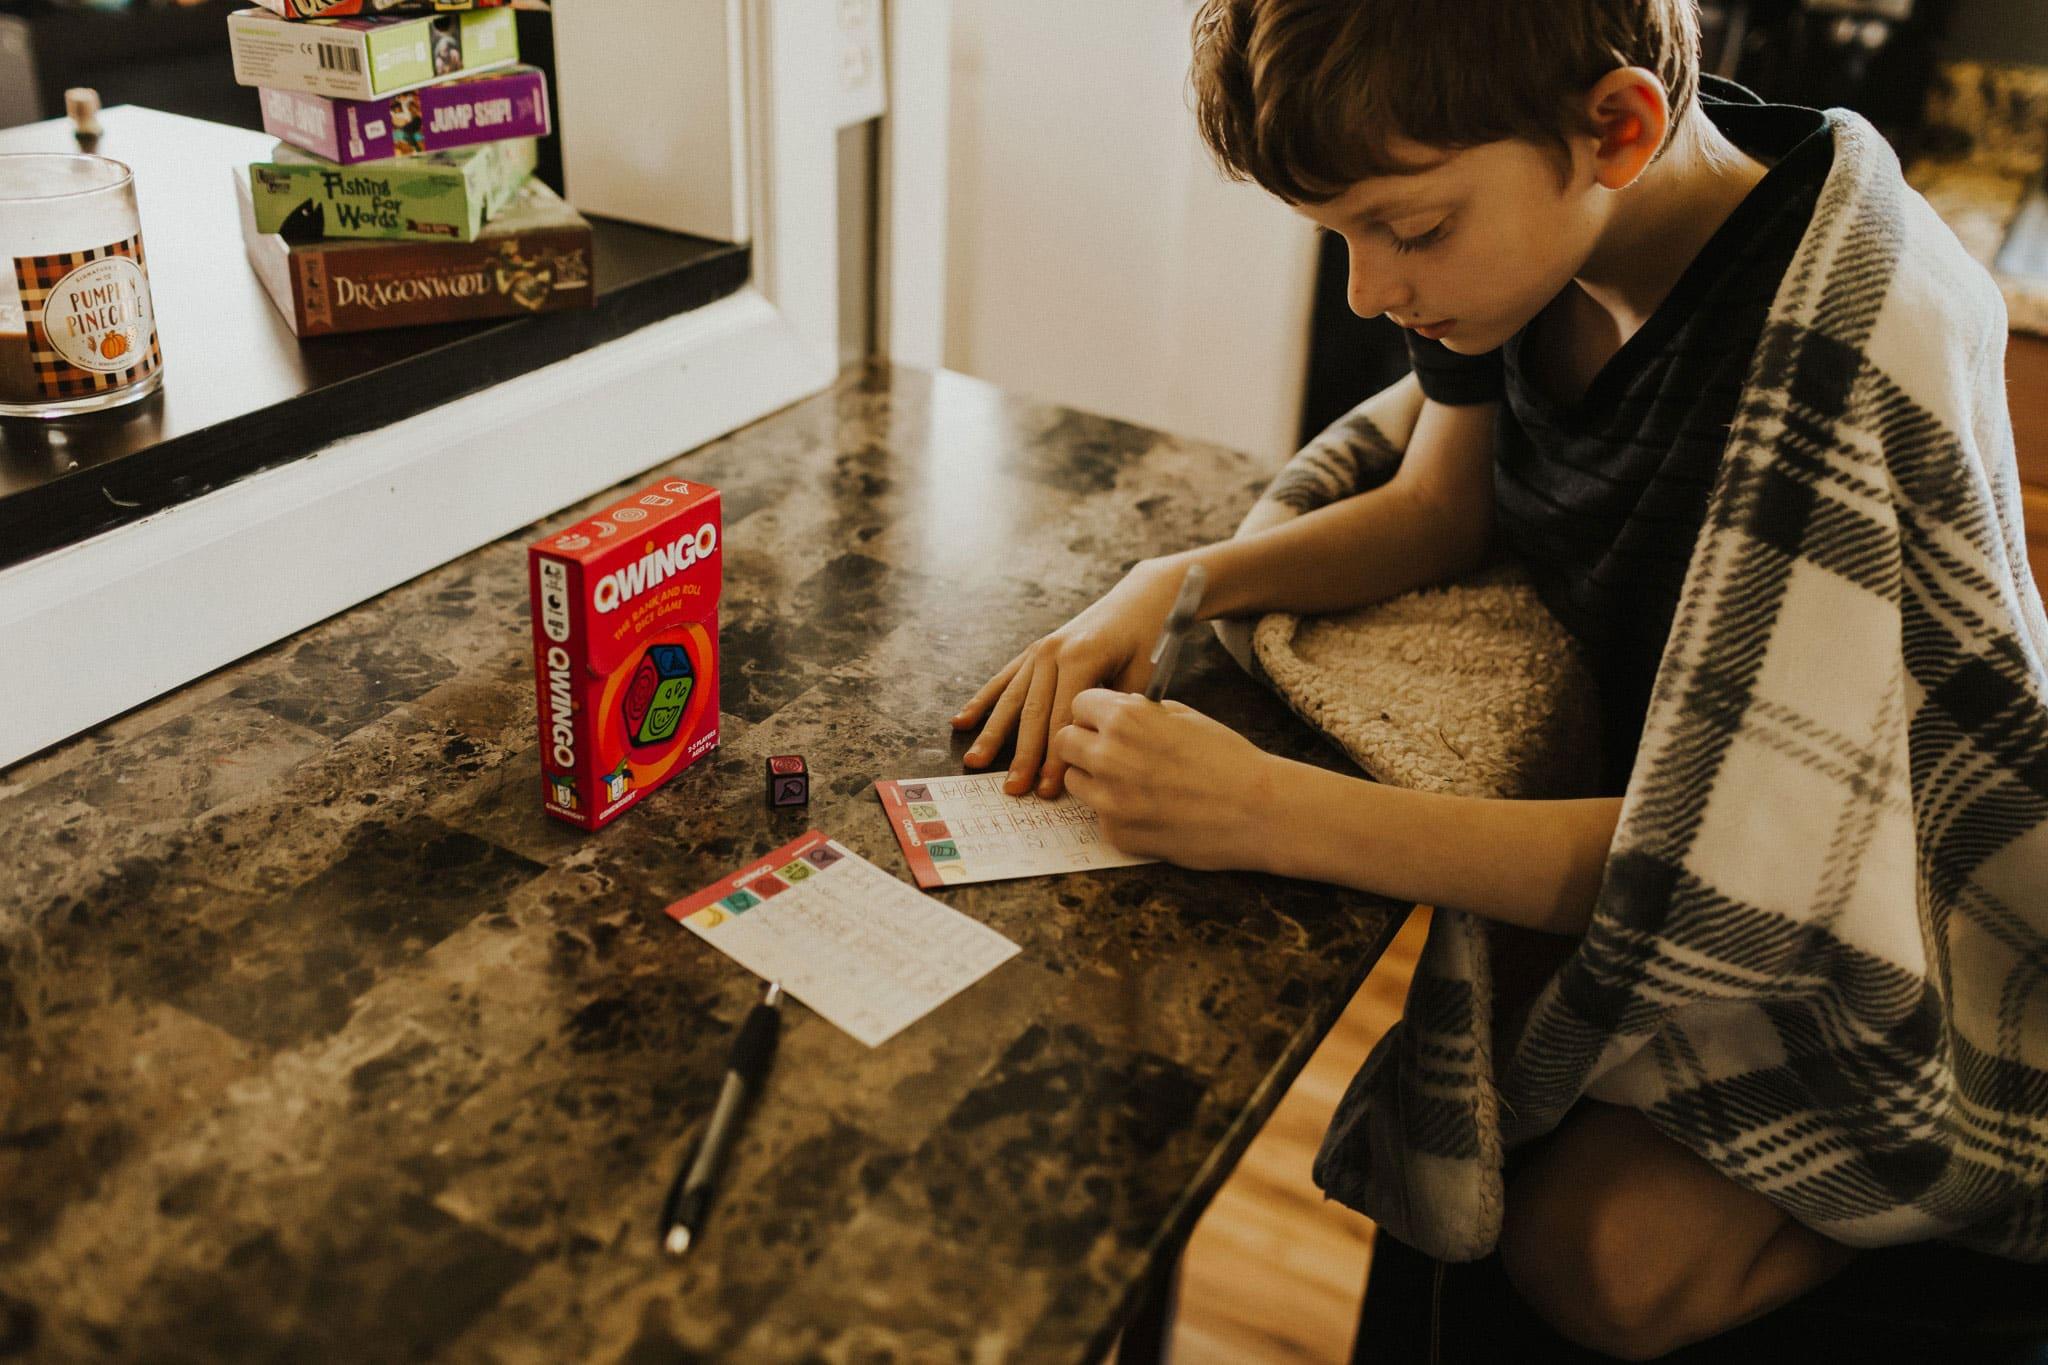 boy playing qwingo, a fun family game